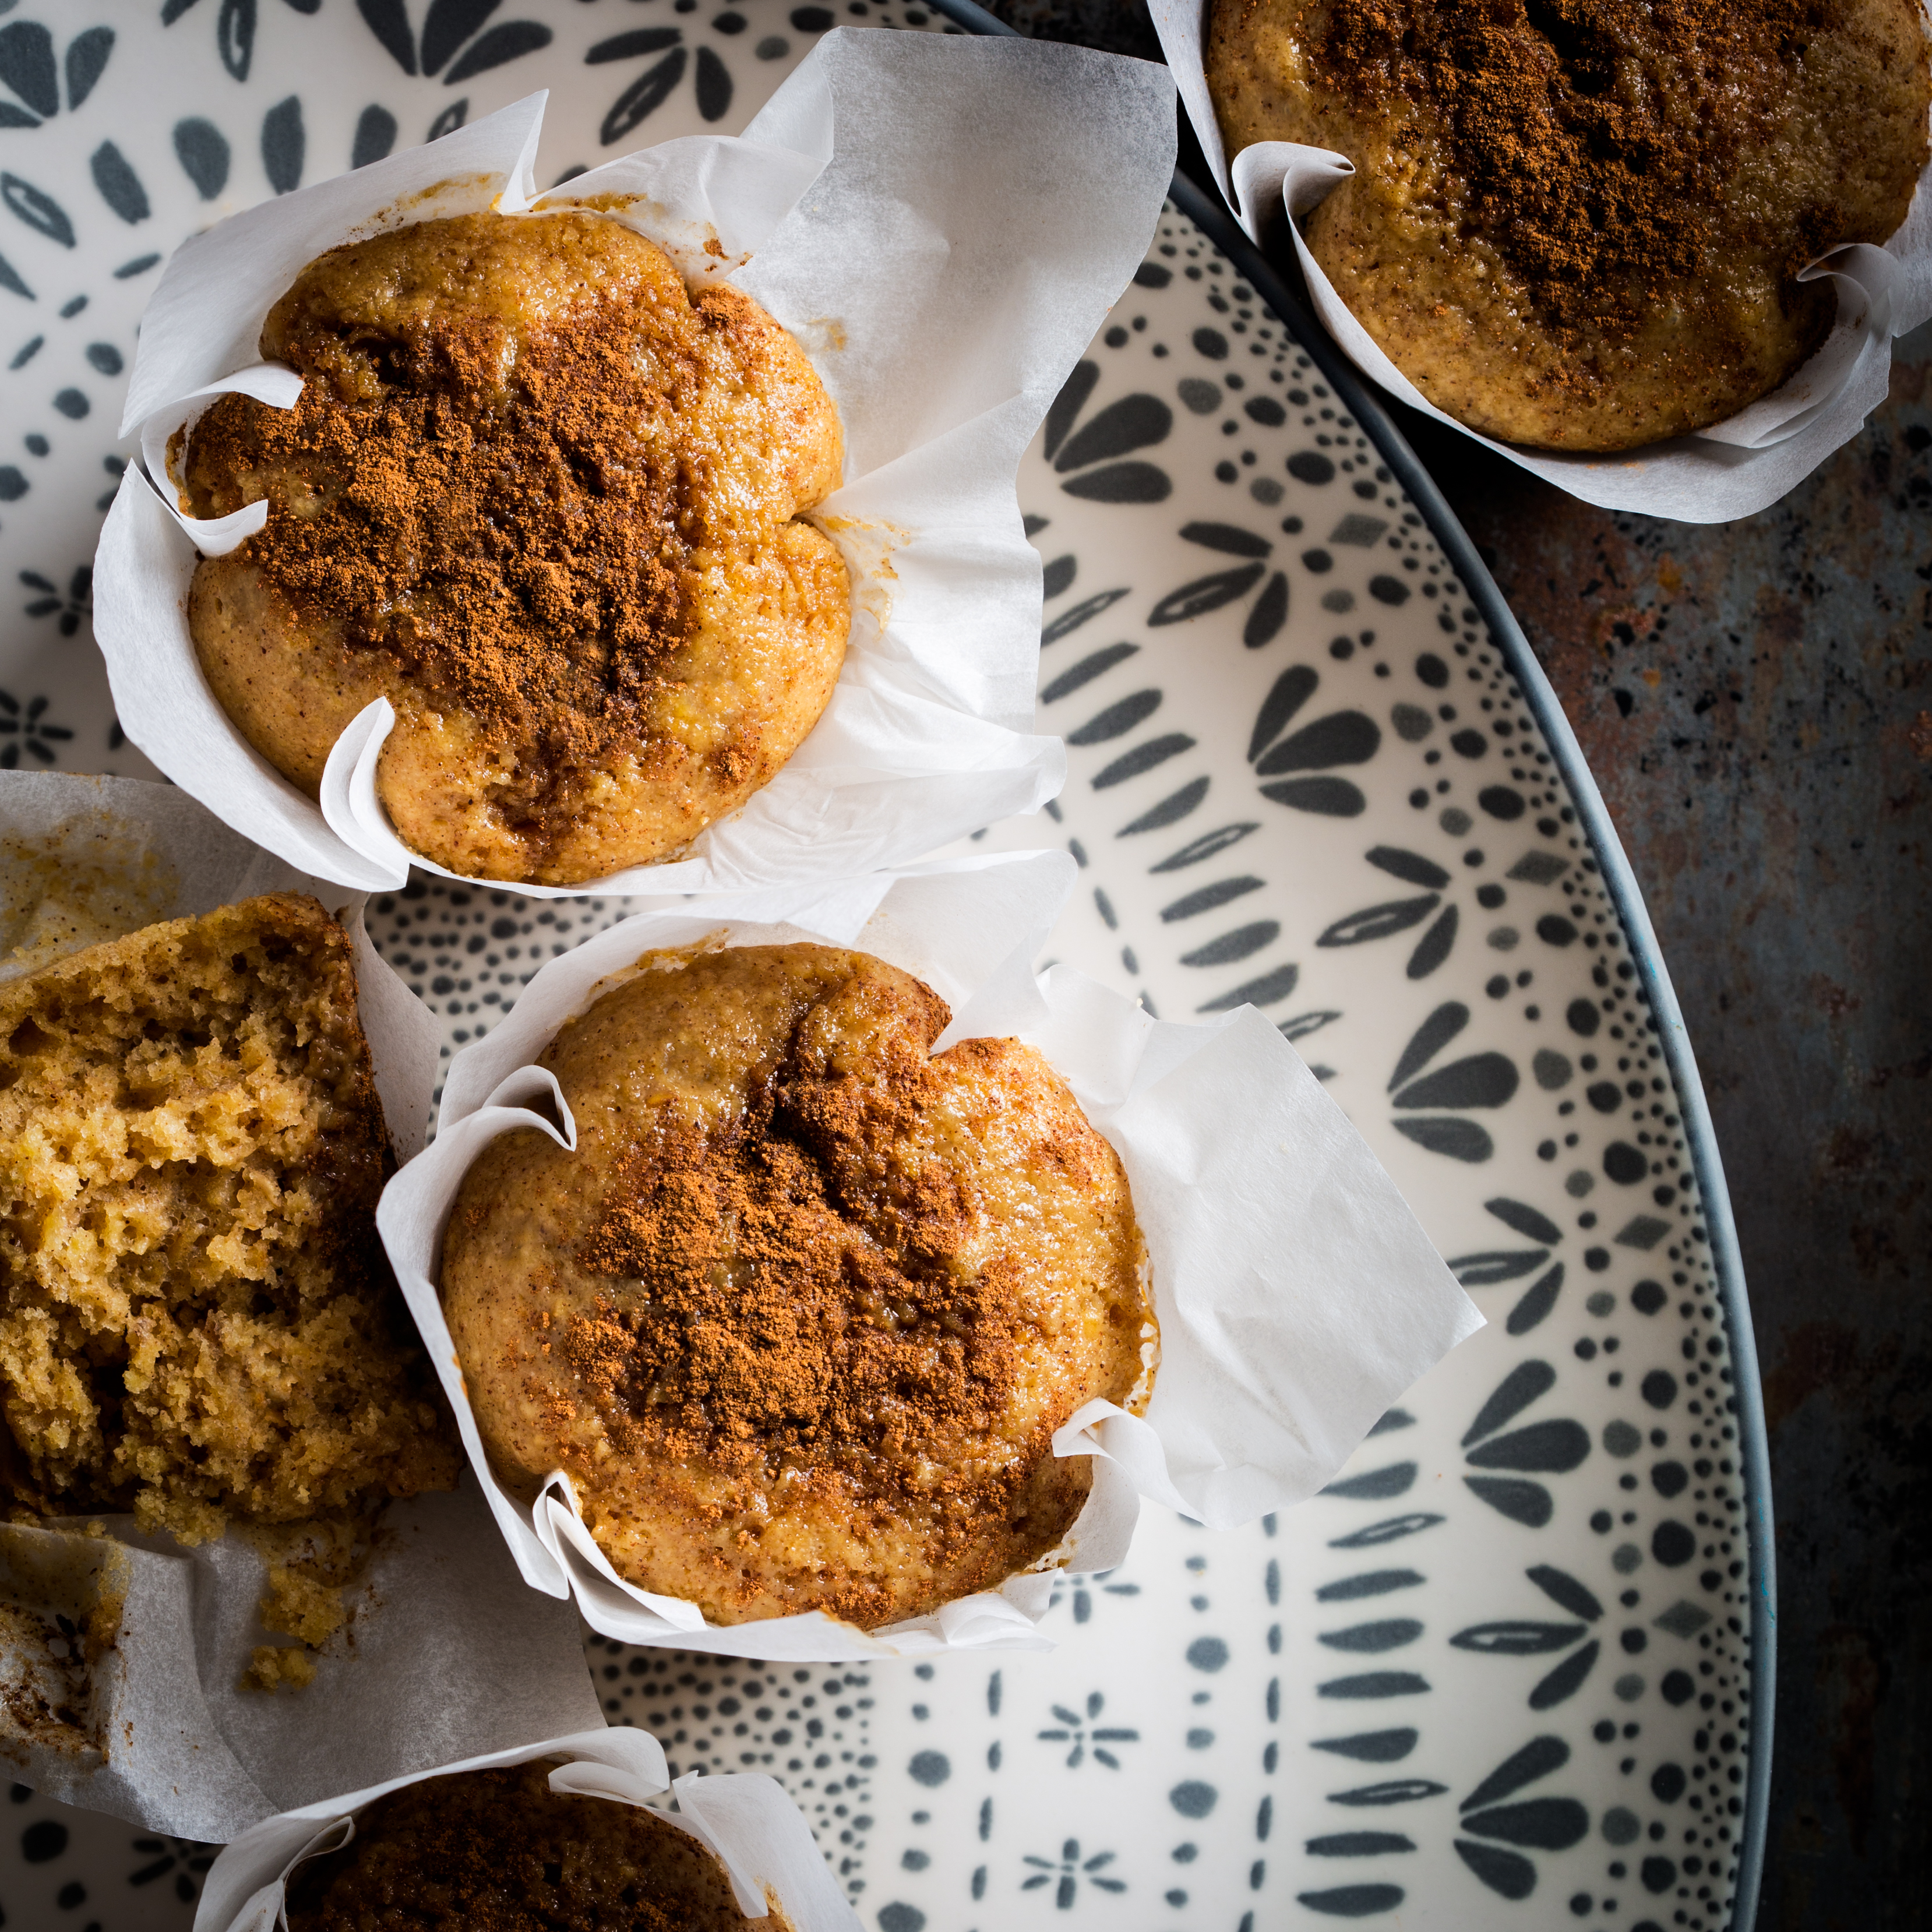 magimix-cook-expert-apple-teacake-muffins